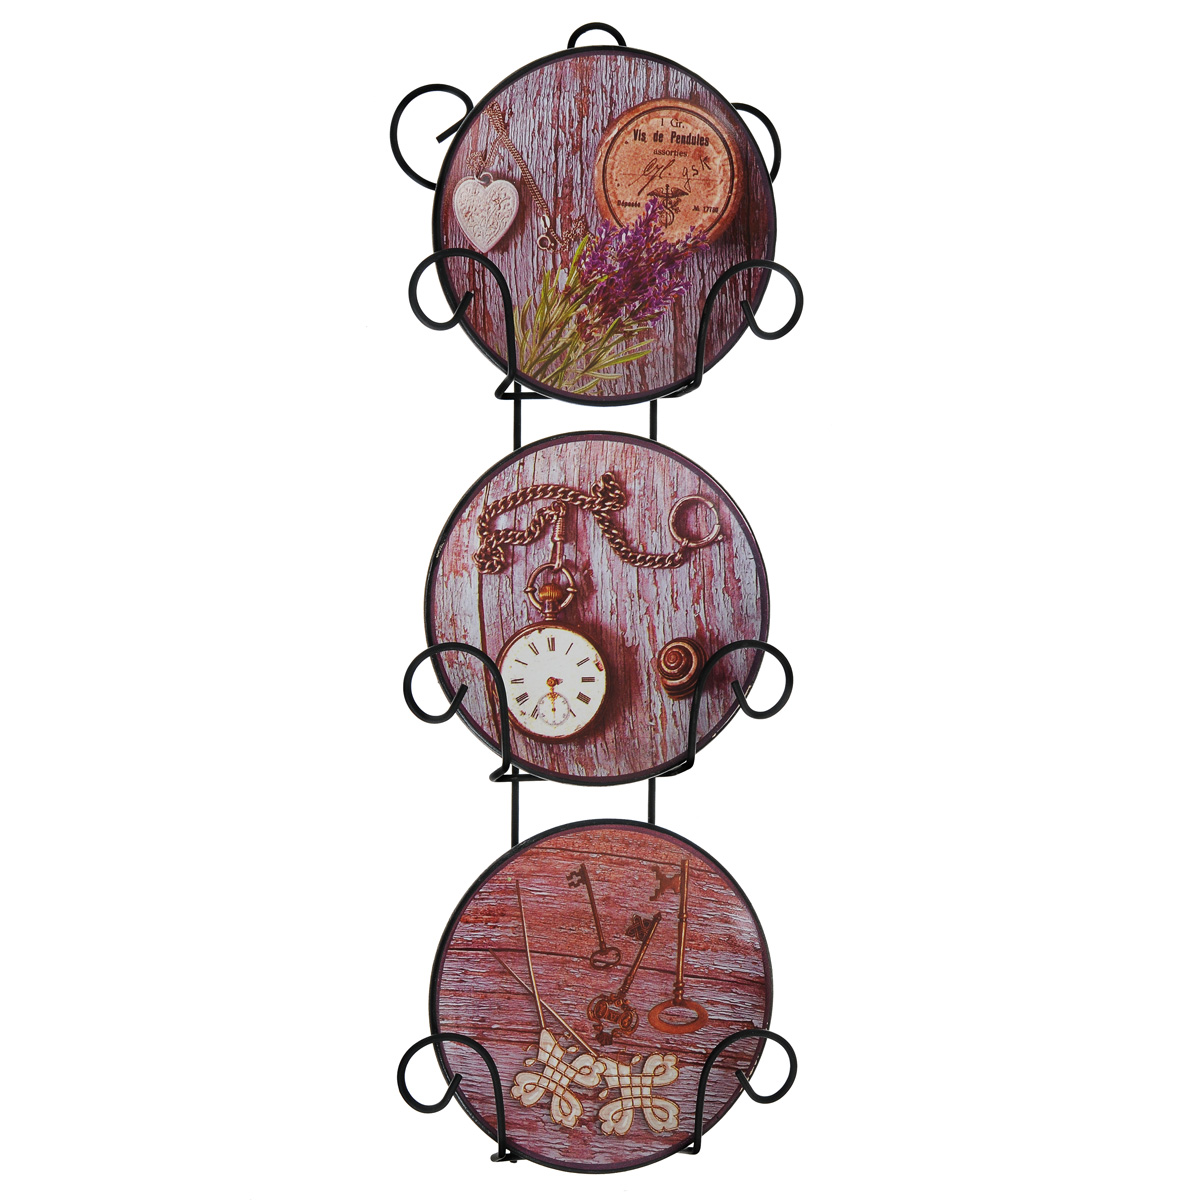 Набор декоративных тарелок Часы, диаметр 10 см, 3 шт54 009305Размер тарелки (без подставки): 10 см х 10 см х 1,5 см. Размер сувенира с подставкой: 2,5 см х 11,5 см х 33 см.